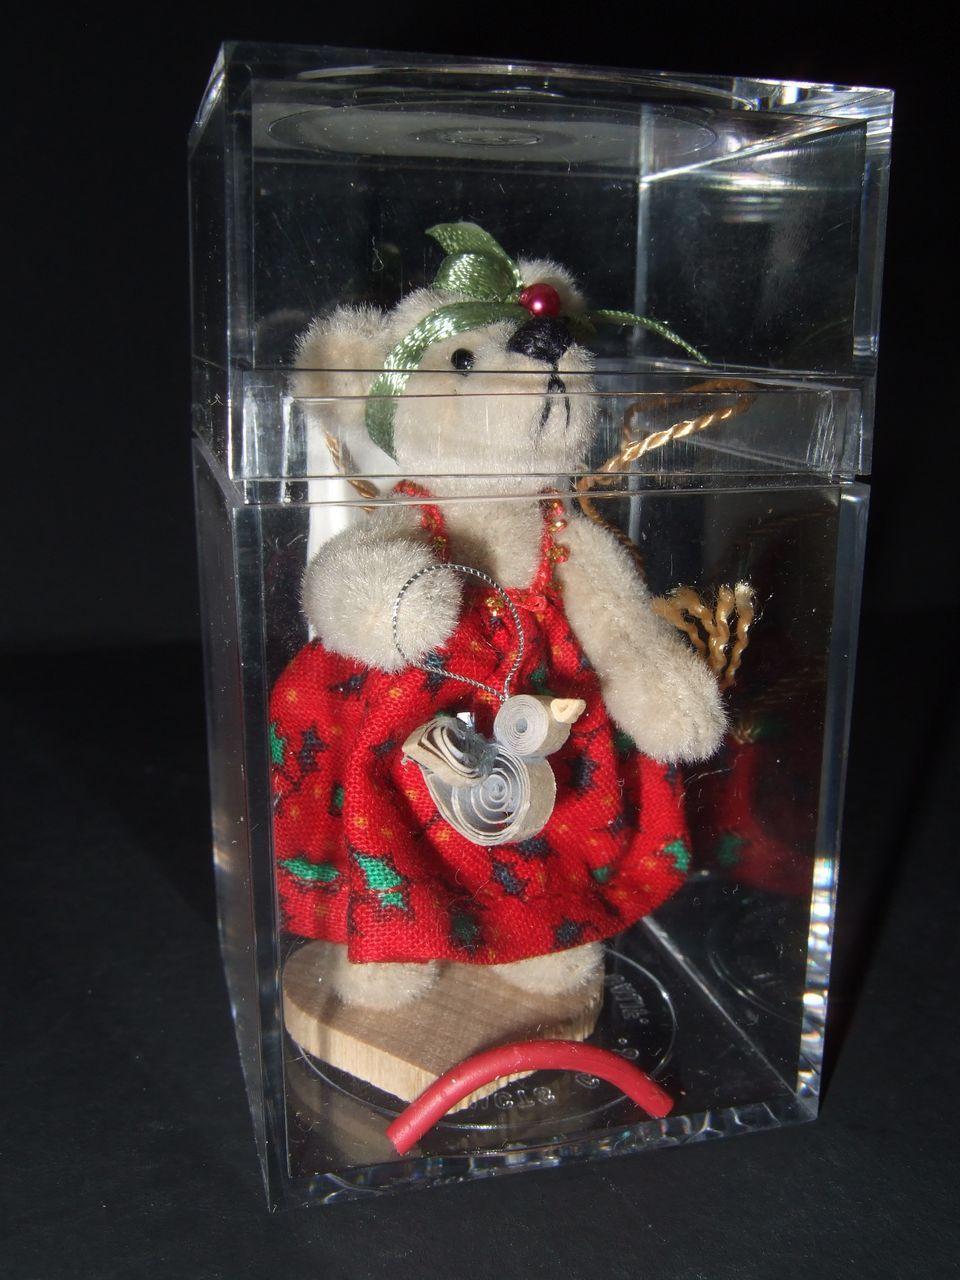 Little Gem Teddy Bear